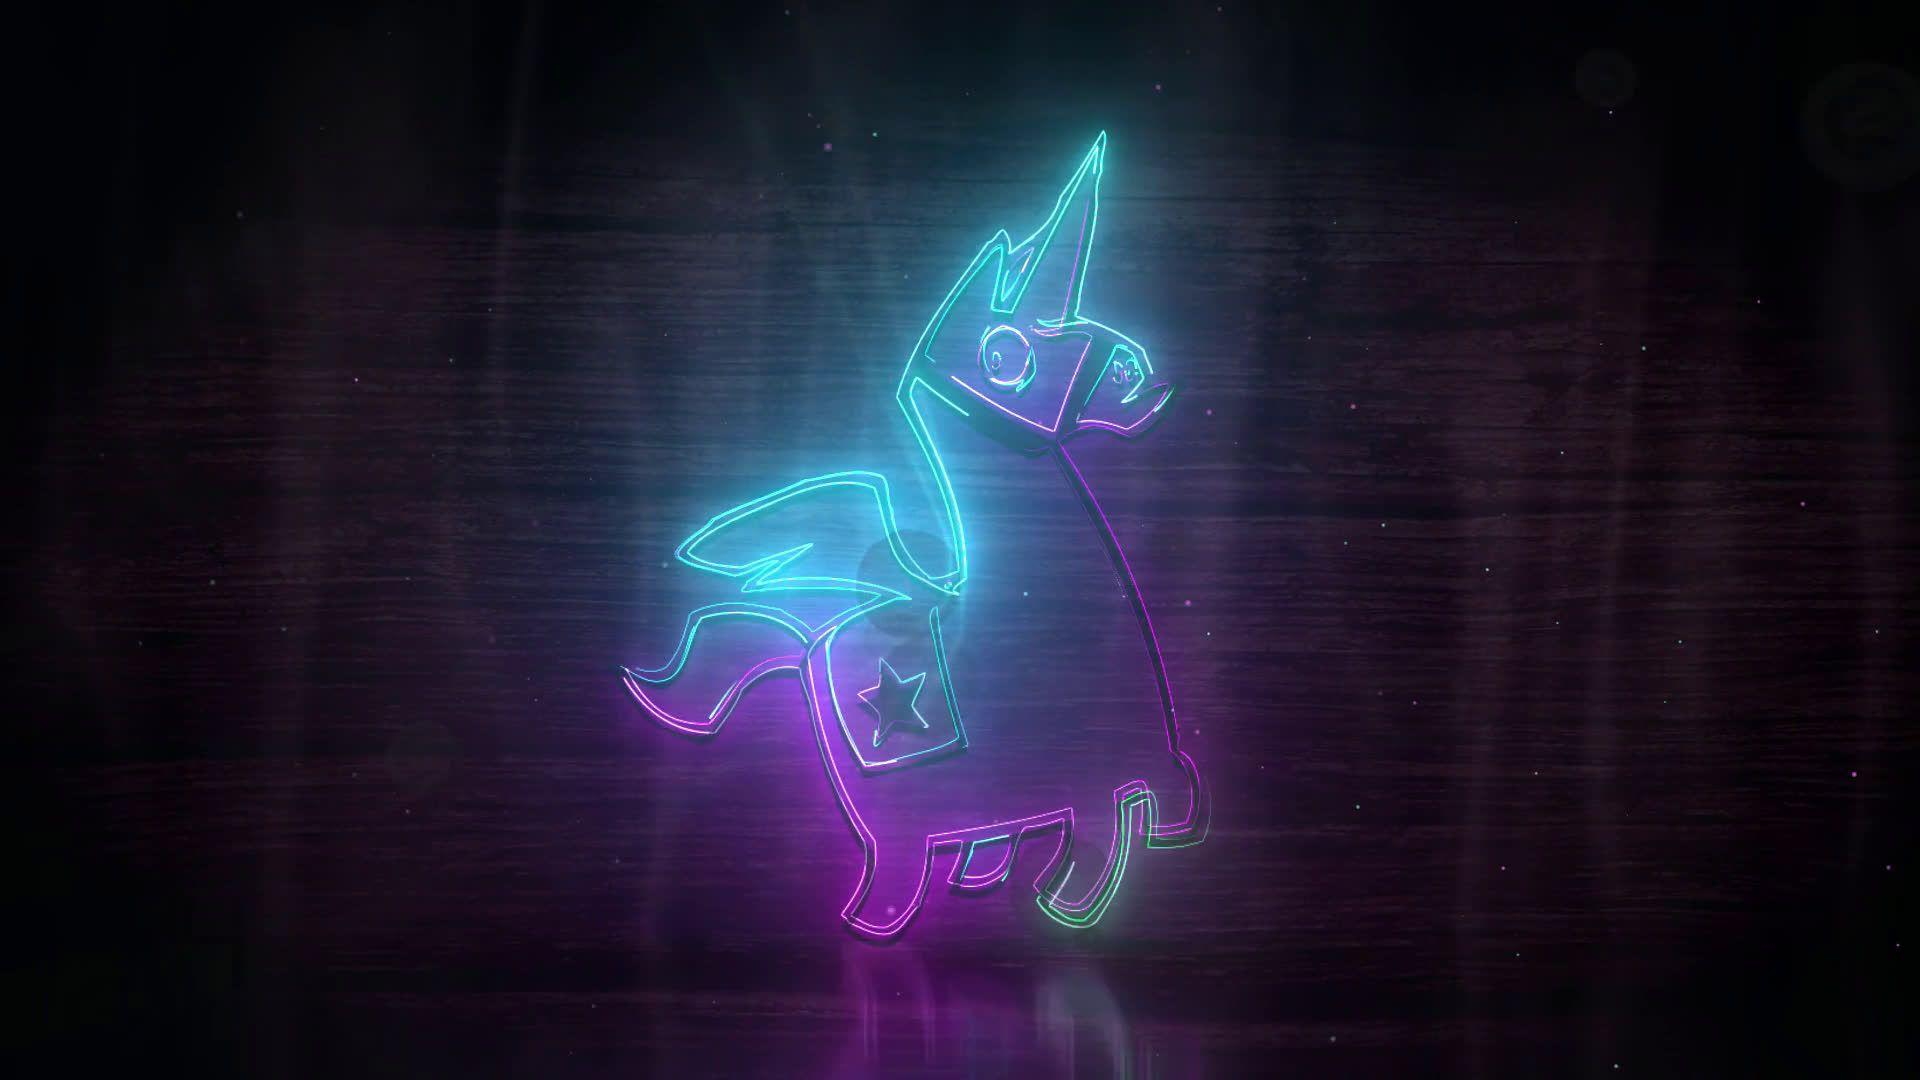 fortnite llama live wallpaper free desktophut - fortnite loot llama background